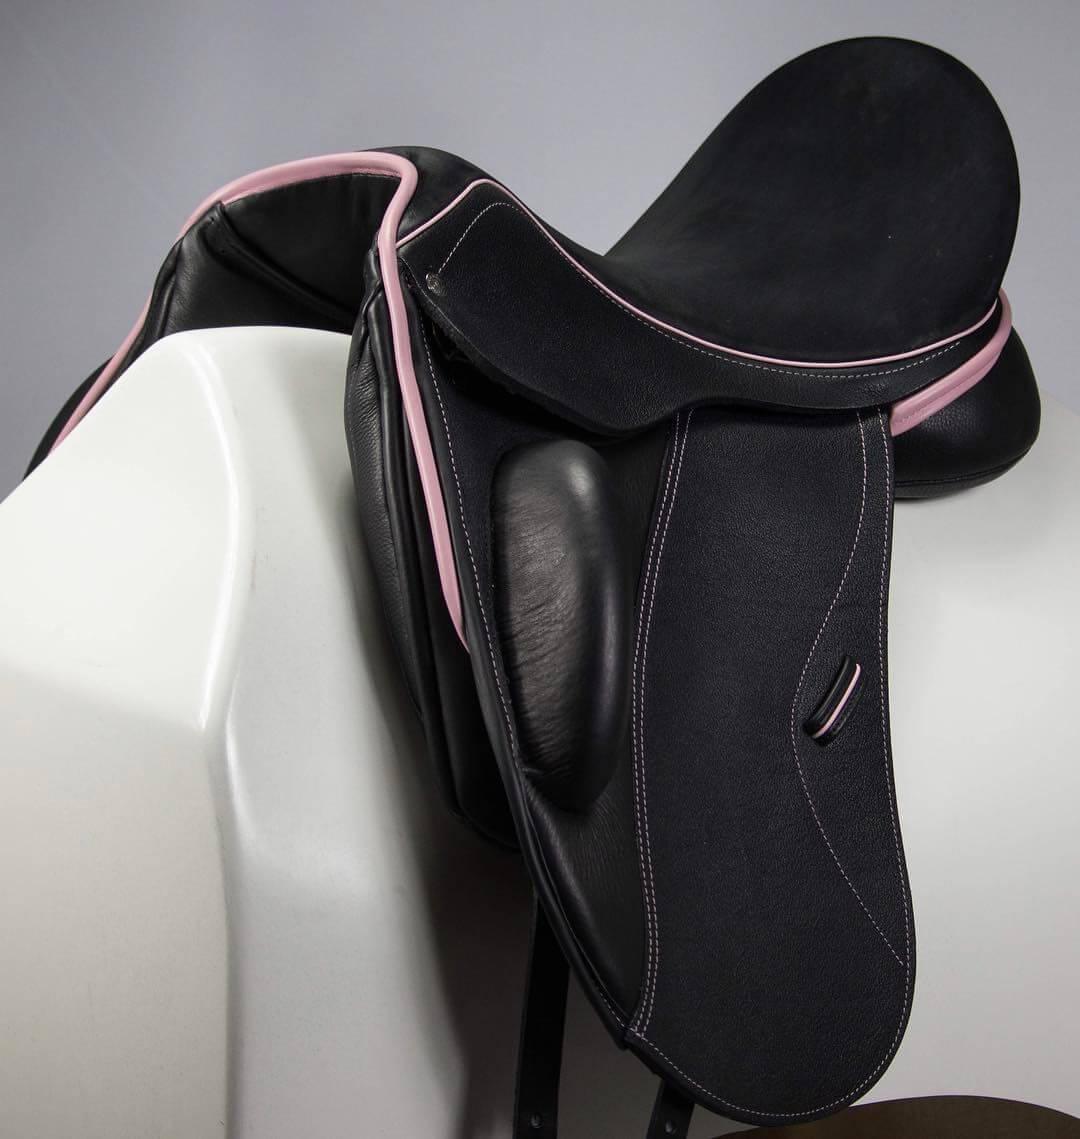 Everest R blk buff pink patent facing welt - Custom Saddlery, Dressage Saddles   Drakesaddlesavvy.com